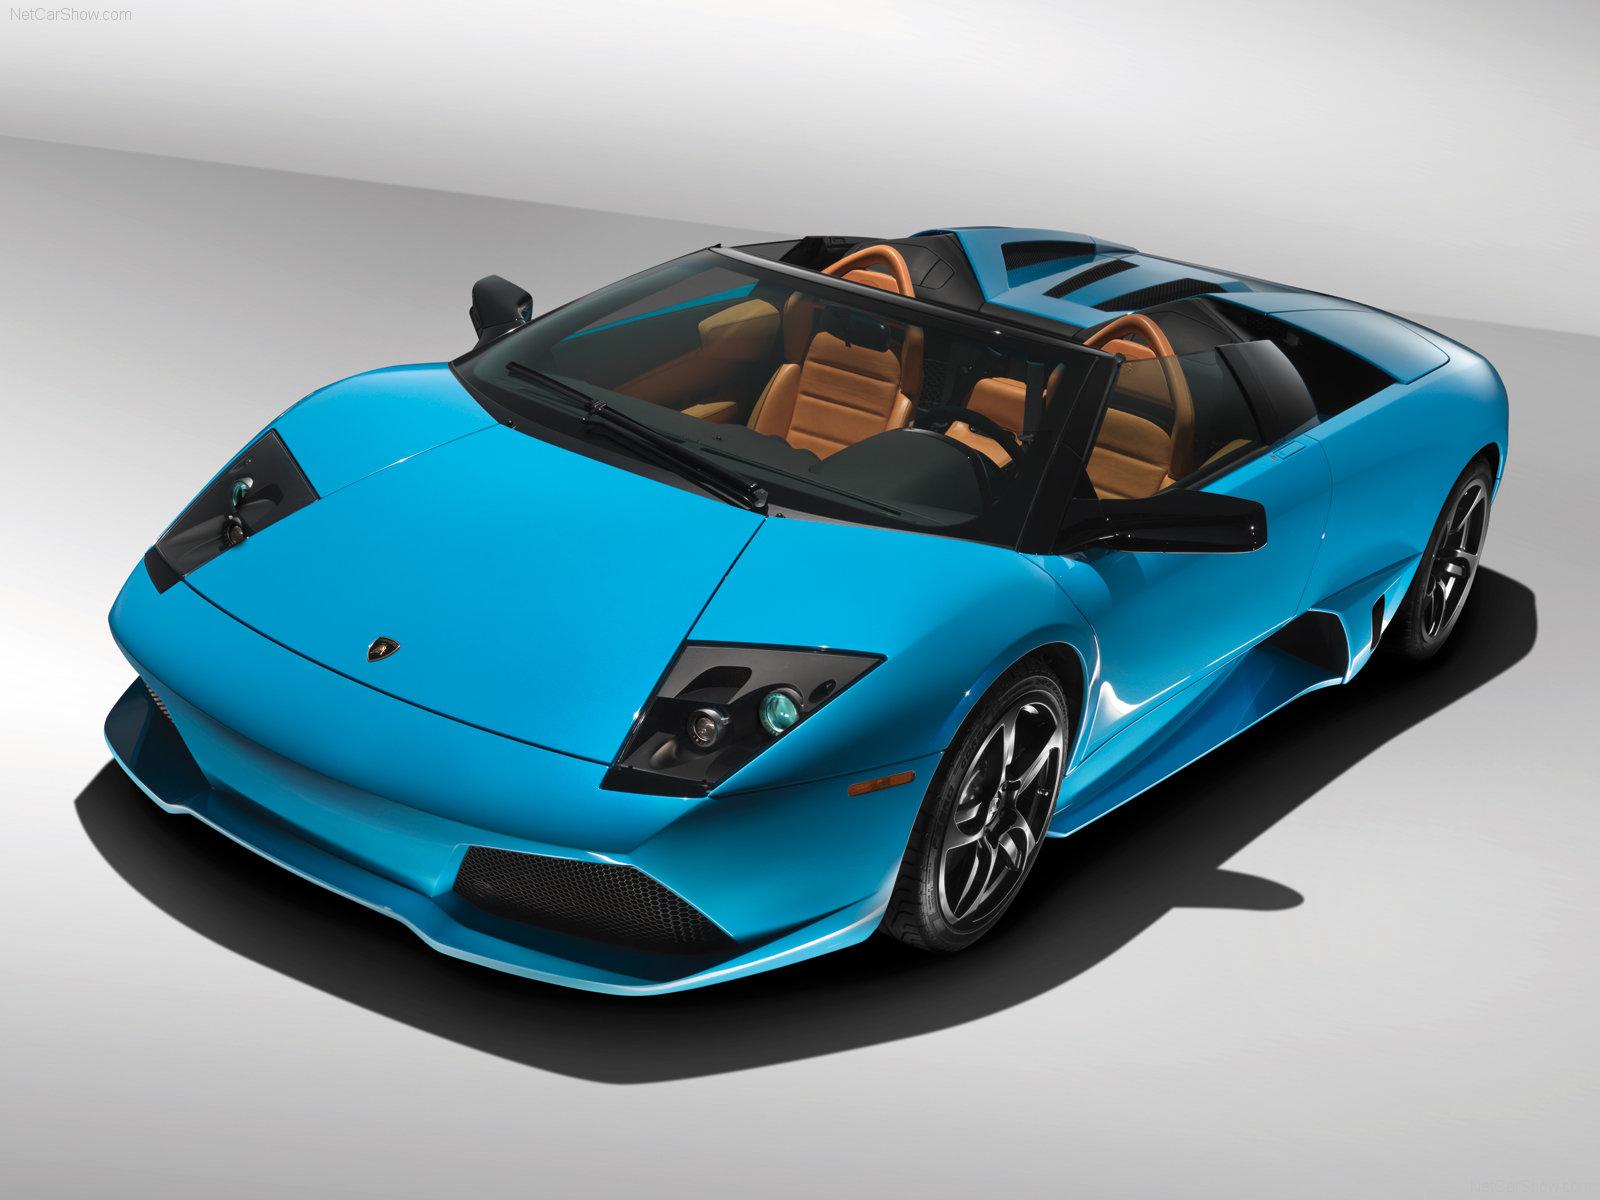 سوناتا 2020 >> Lamborghini Murcielago LP640 photos - PhotoGallery with 36 ...